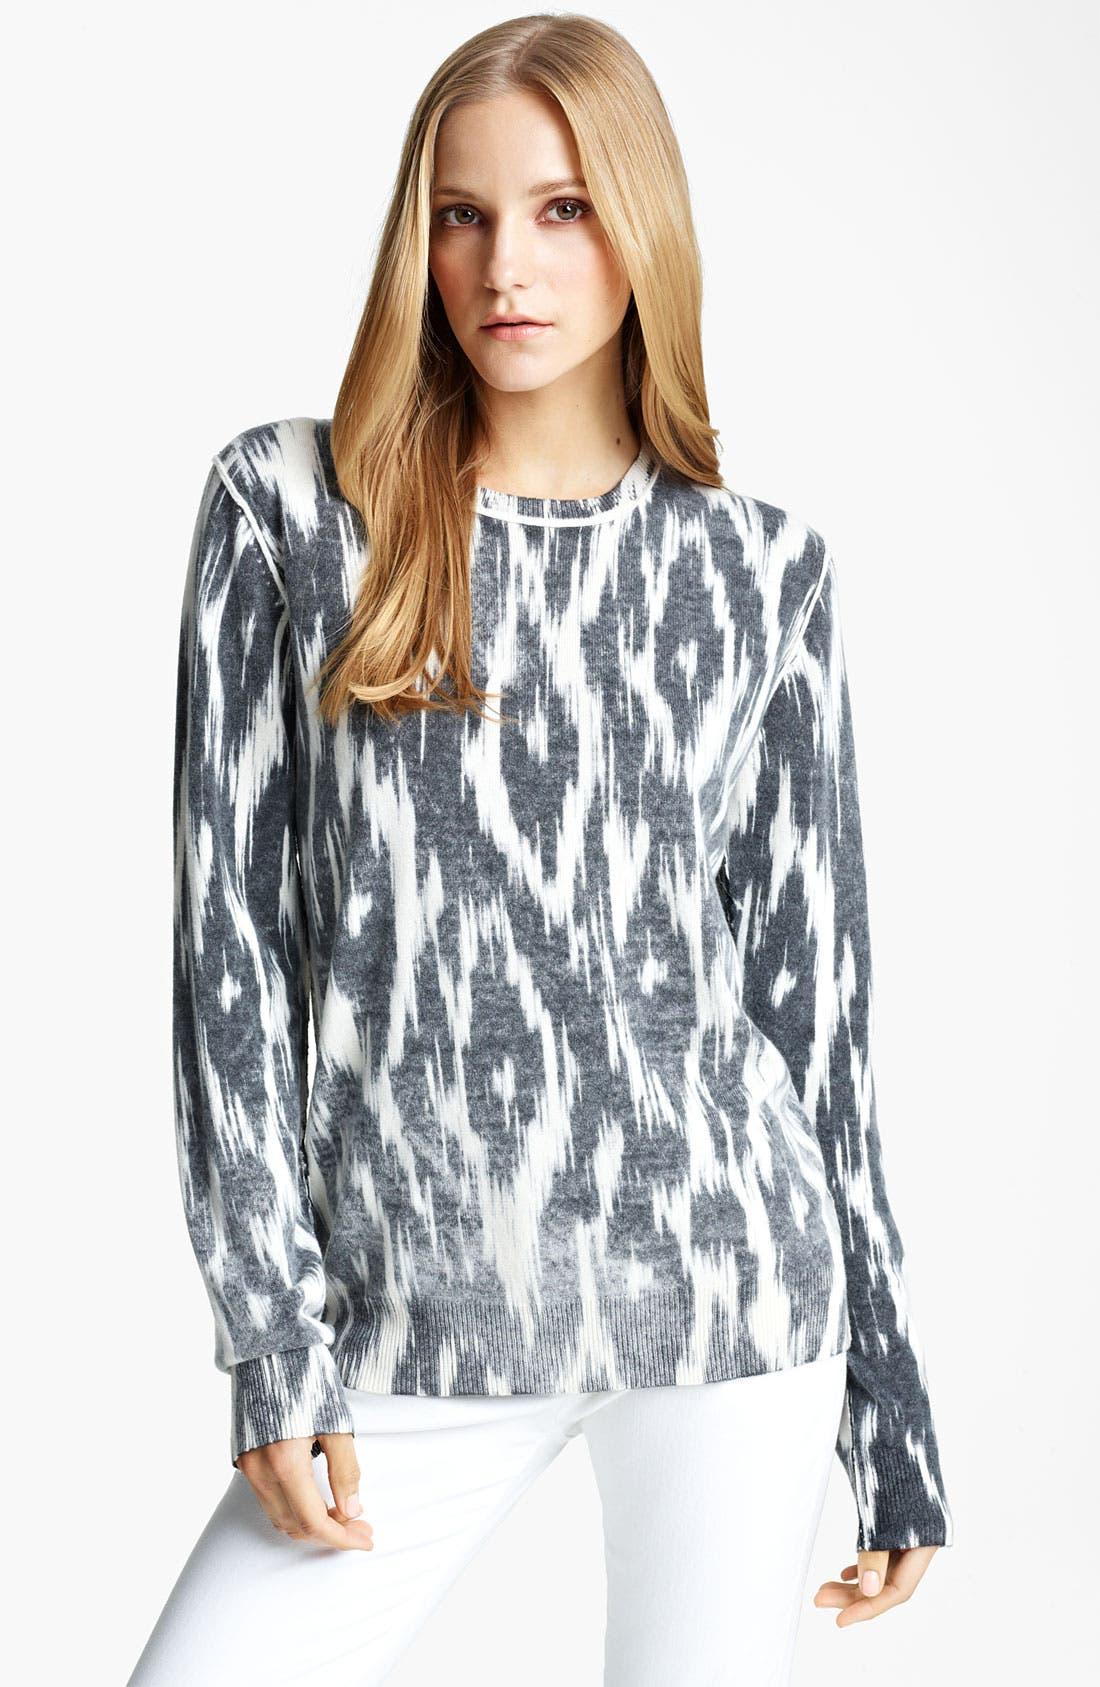 Main Image - Michael Kors Ikat Print Cashmere Pullover